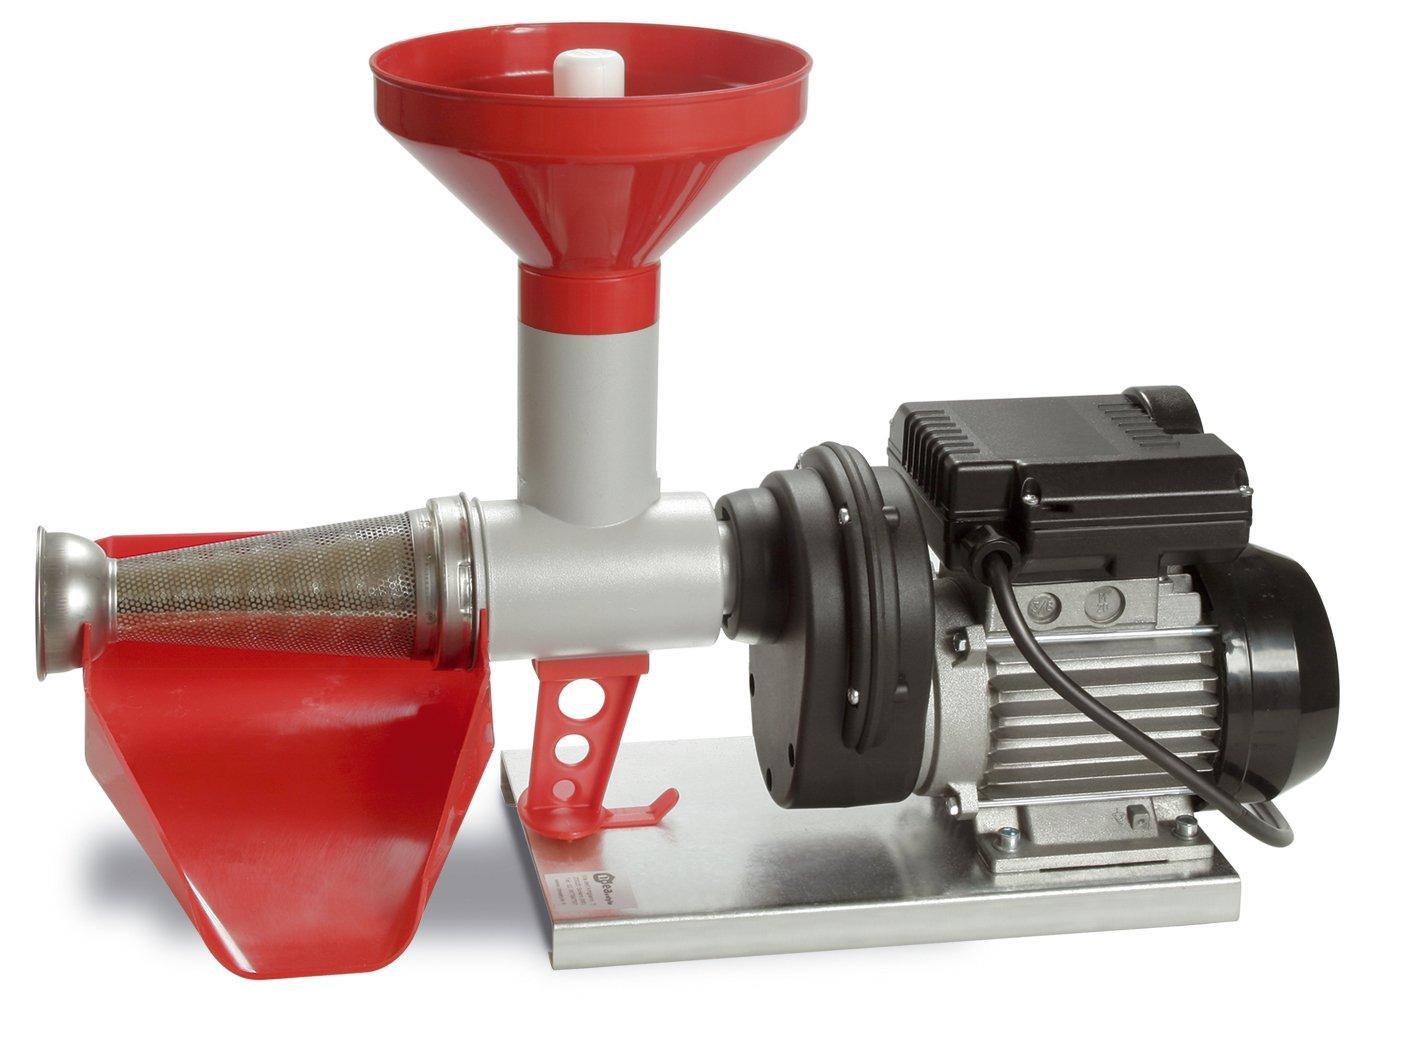 RGV POMMI - Exprimidor (Exprimidor lenta, Negro, Gris, Rojo, Aluminio, Acero inoxidable, 400 W, 395 mm): Amazon.es: Hogar